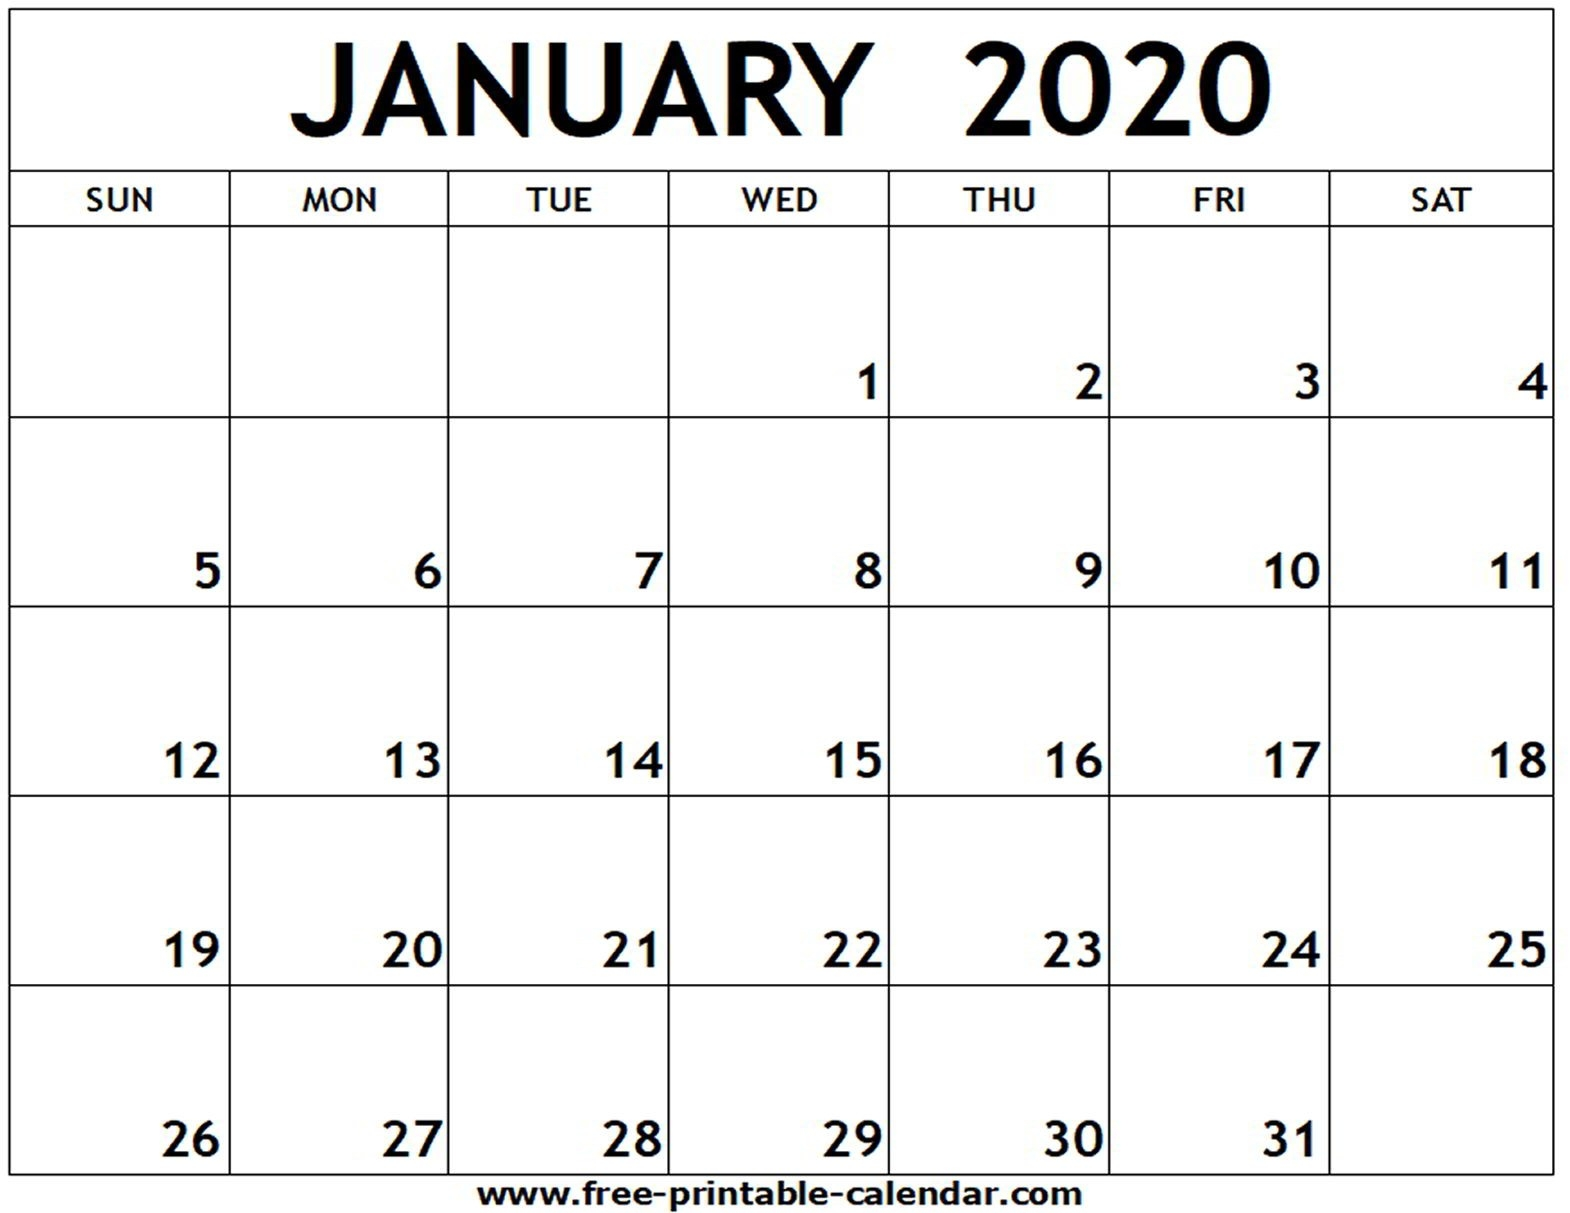 January 2020 Printable Calendar - Free-Printable-Calendar-Blank Calandar Of Events 2020